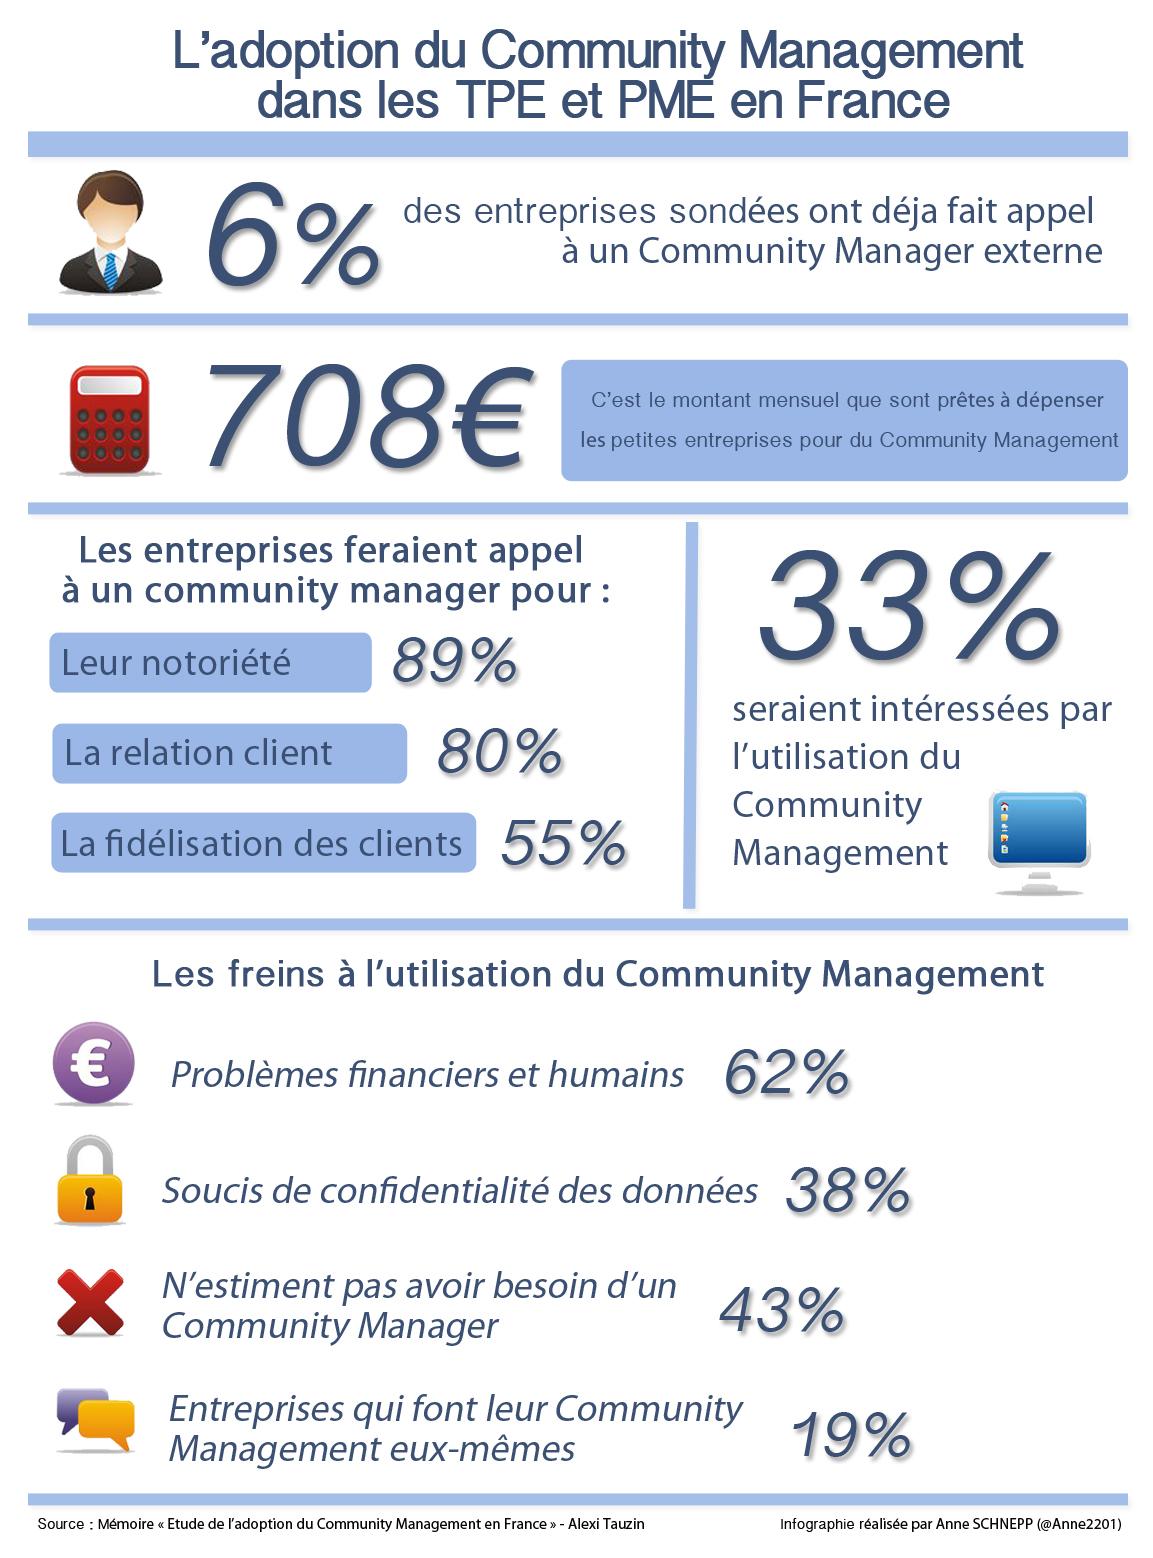 Infographie : Adoption Community Management TPE PME